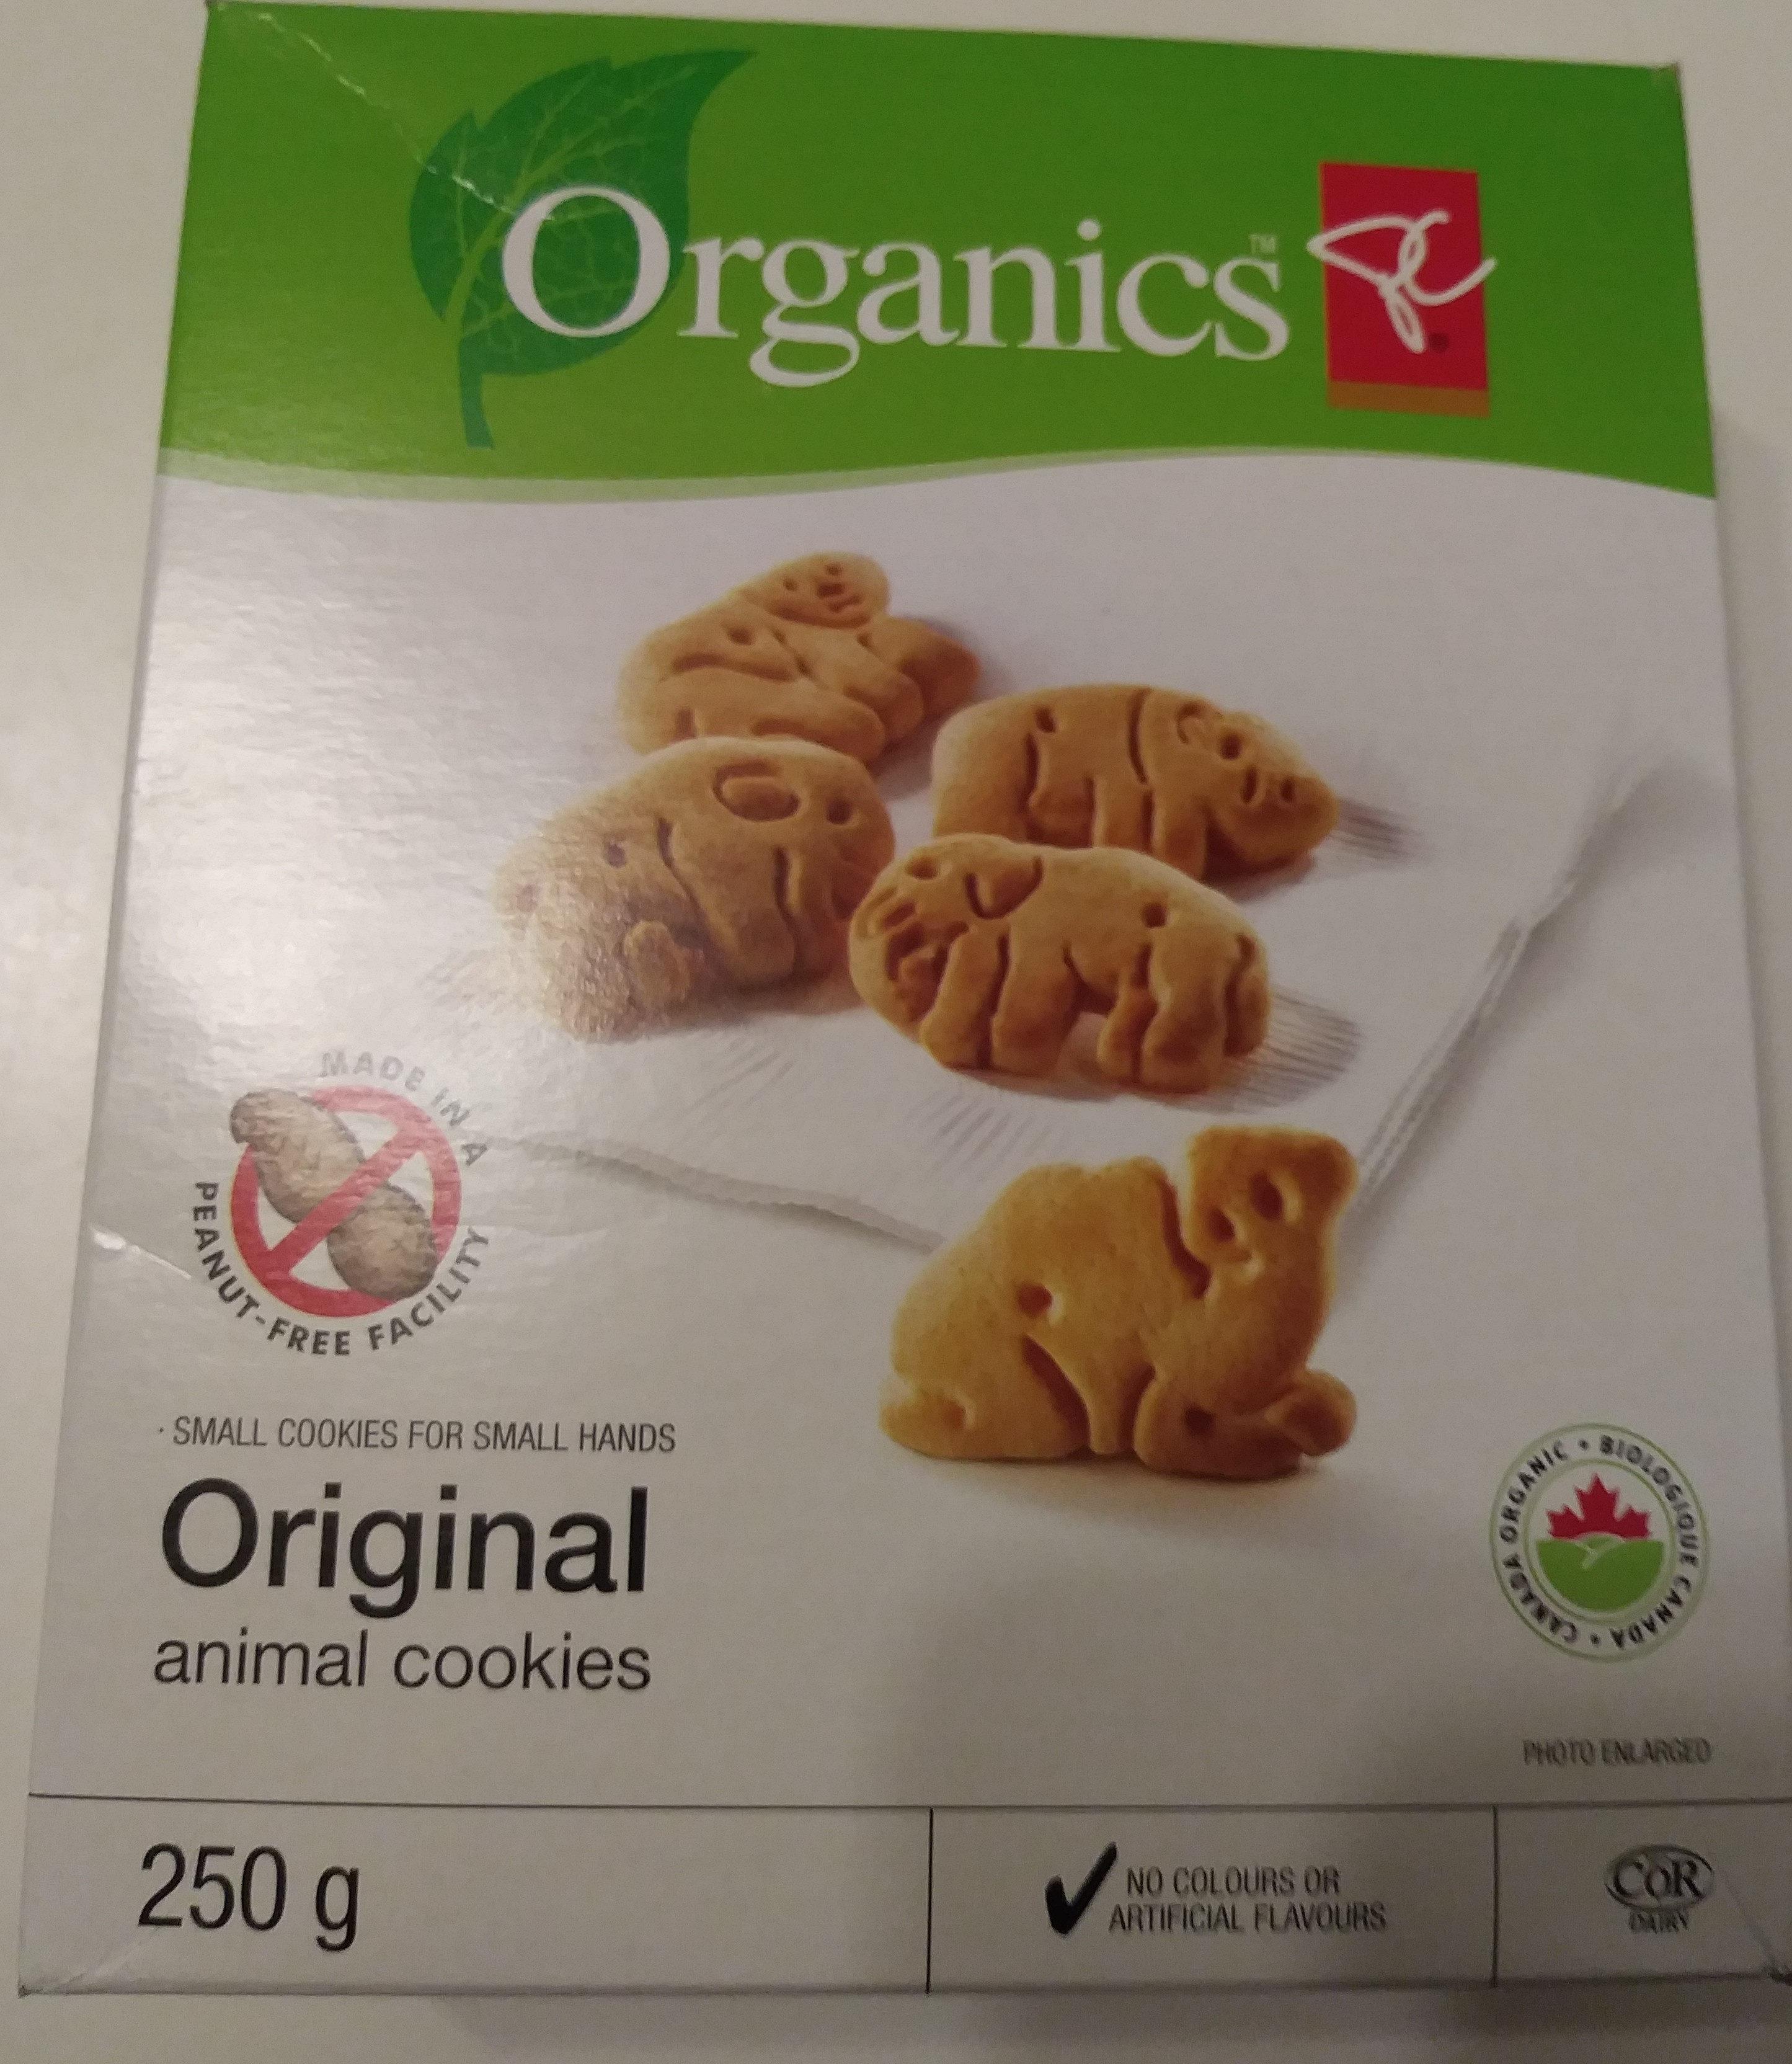 Original animal cookies - Product - fr